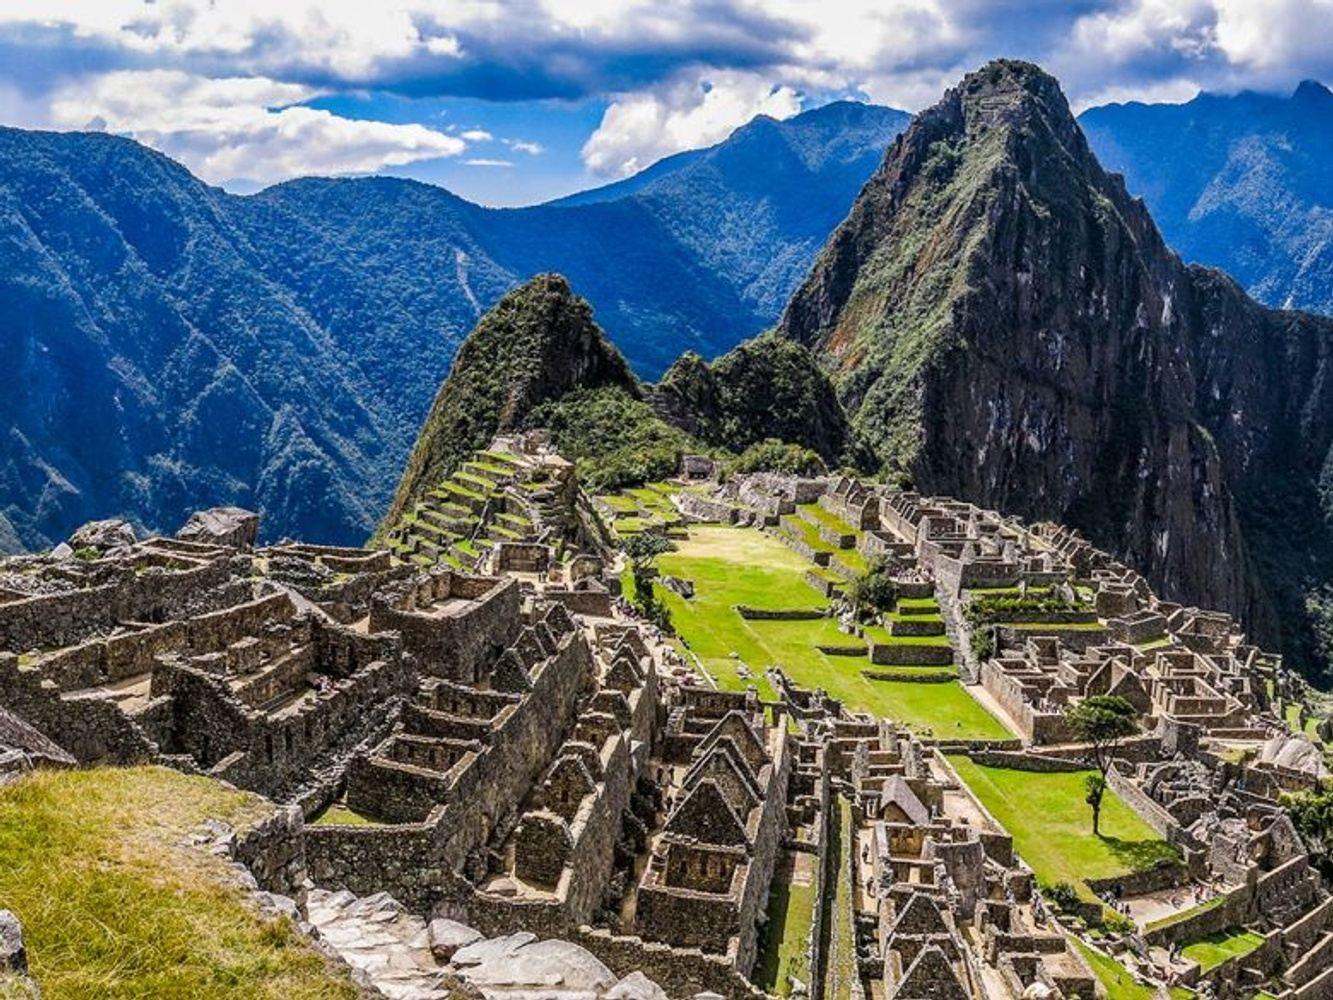 Travel Slay presents: Peru 2020 Fitness Retreat